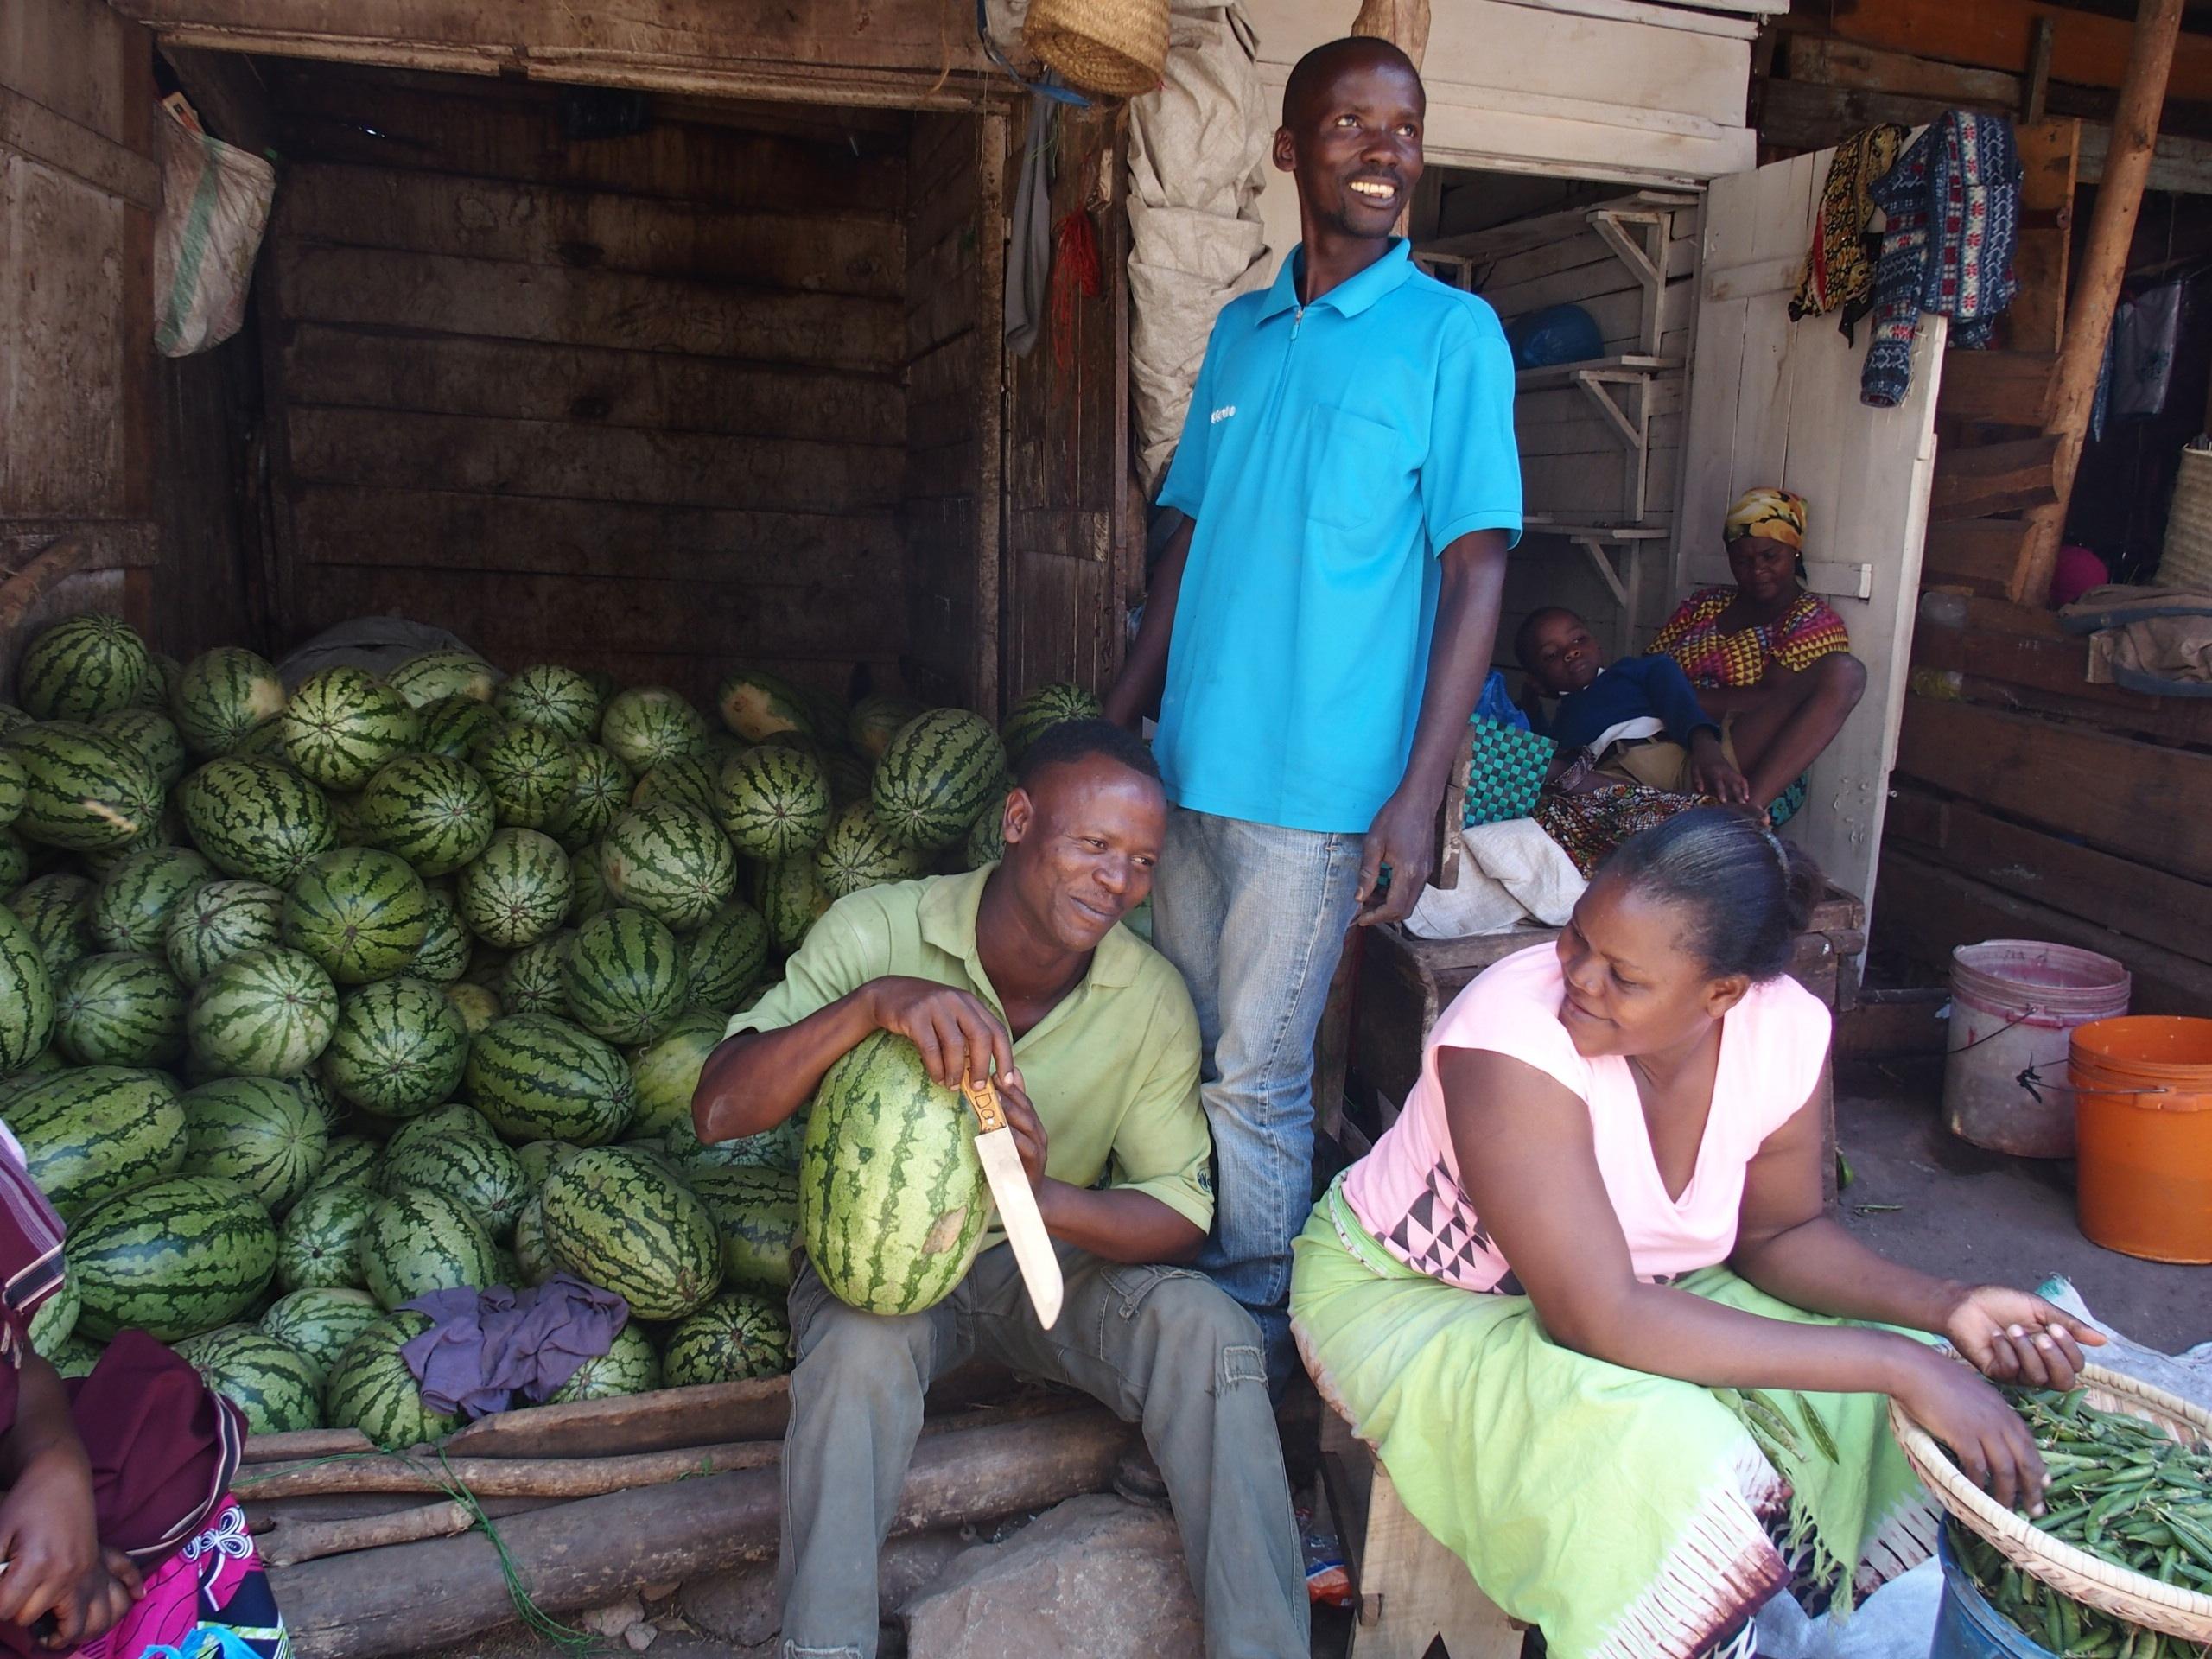 Marchand de pastèques marché Dar es Salaam Tanzanie